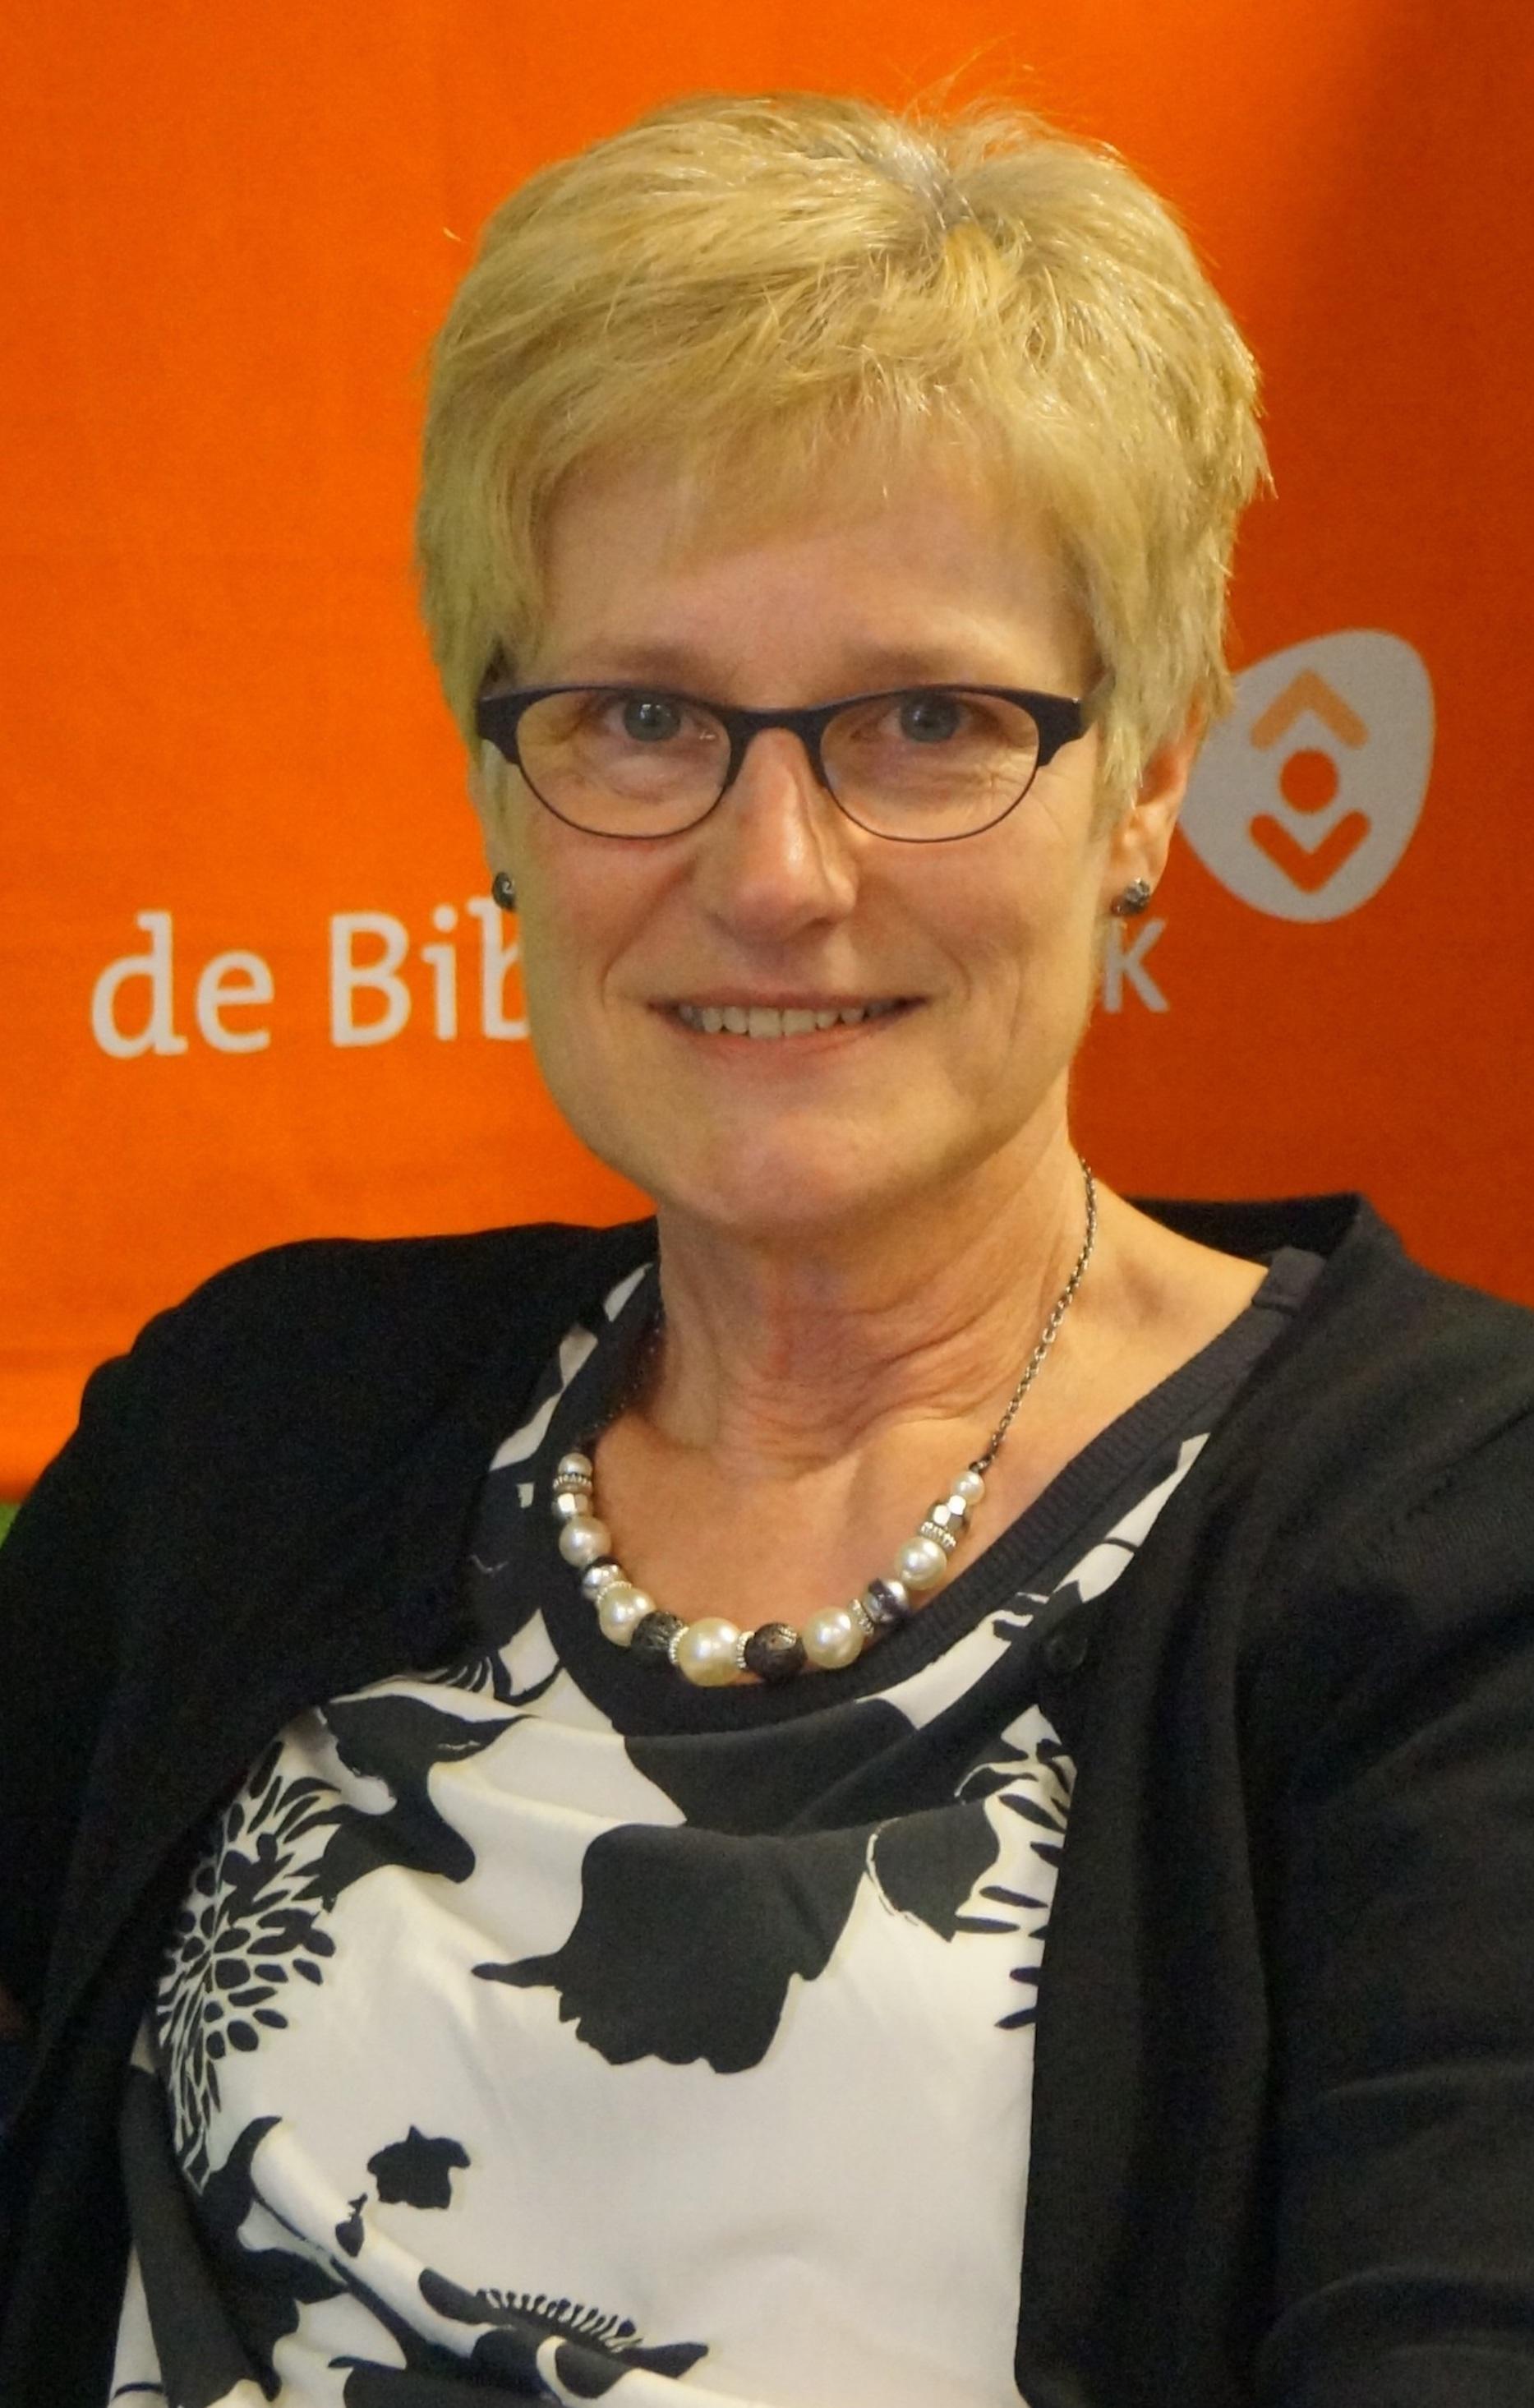 Jannie van Vugt